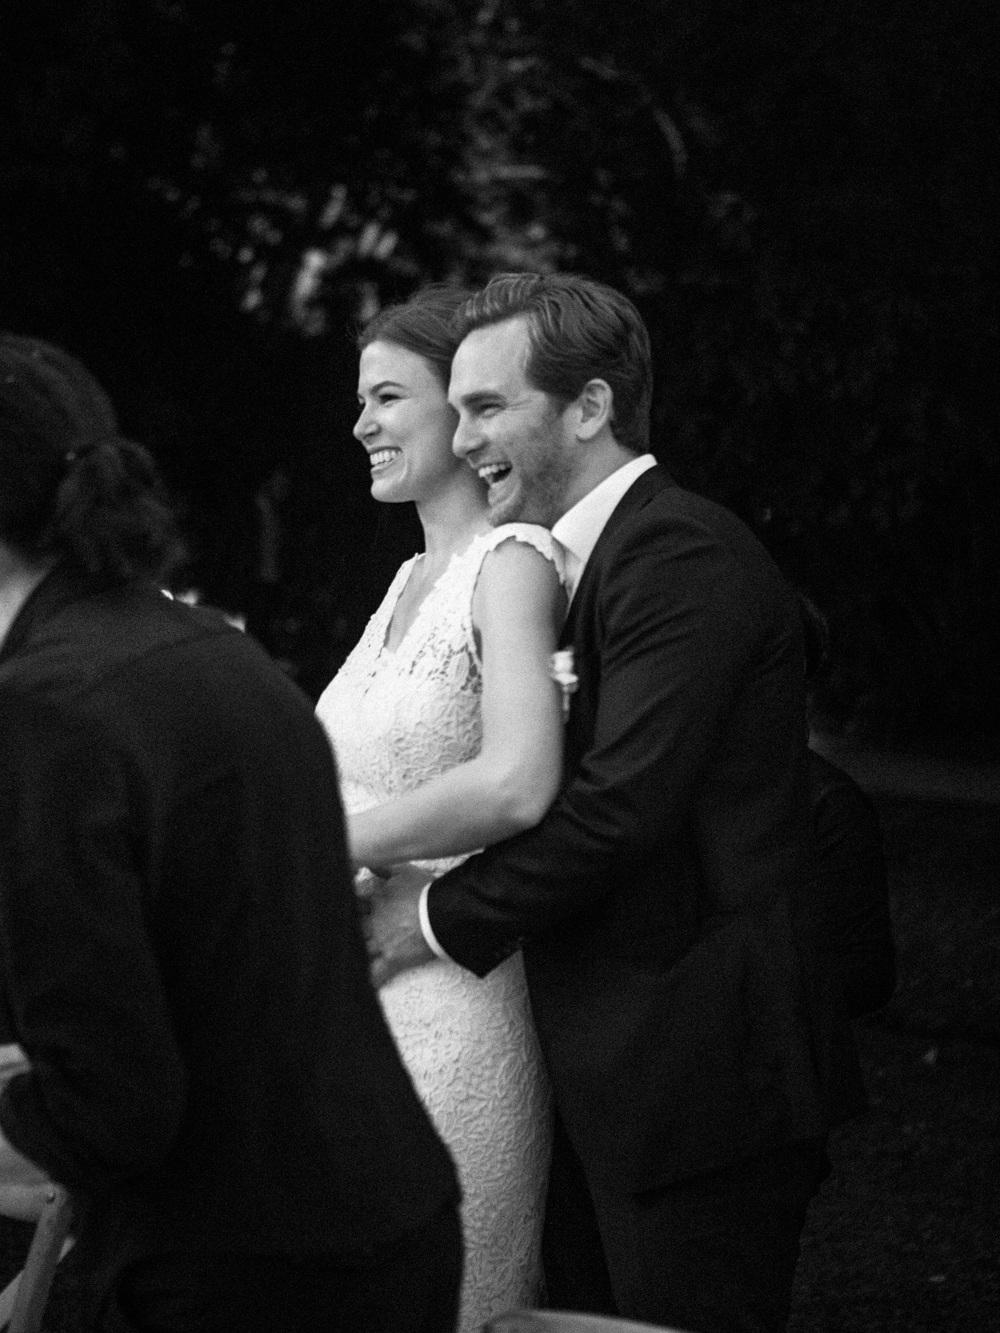 Provence_Wedding_%28c%29_Rory_Wylie-173.jpg